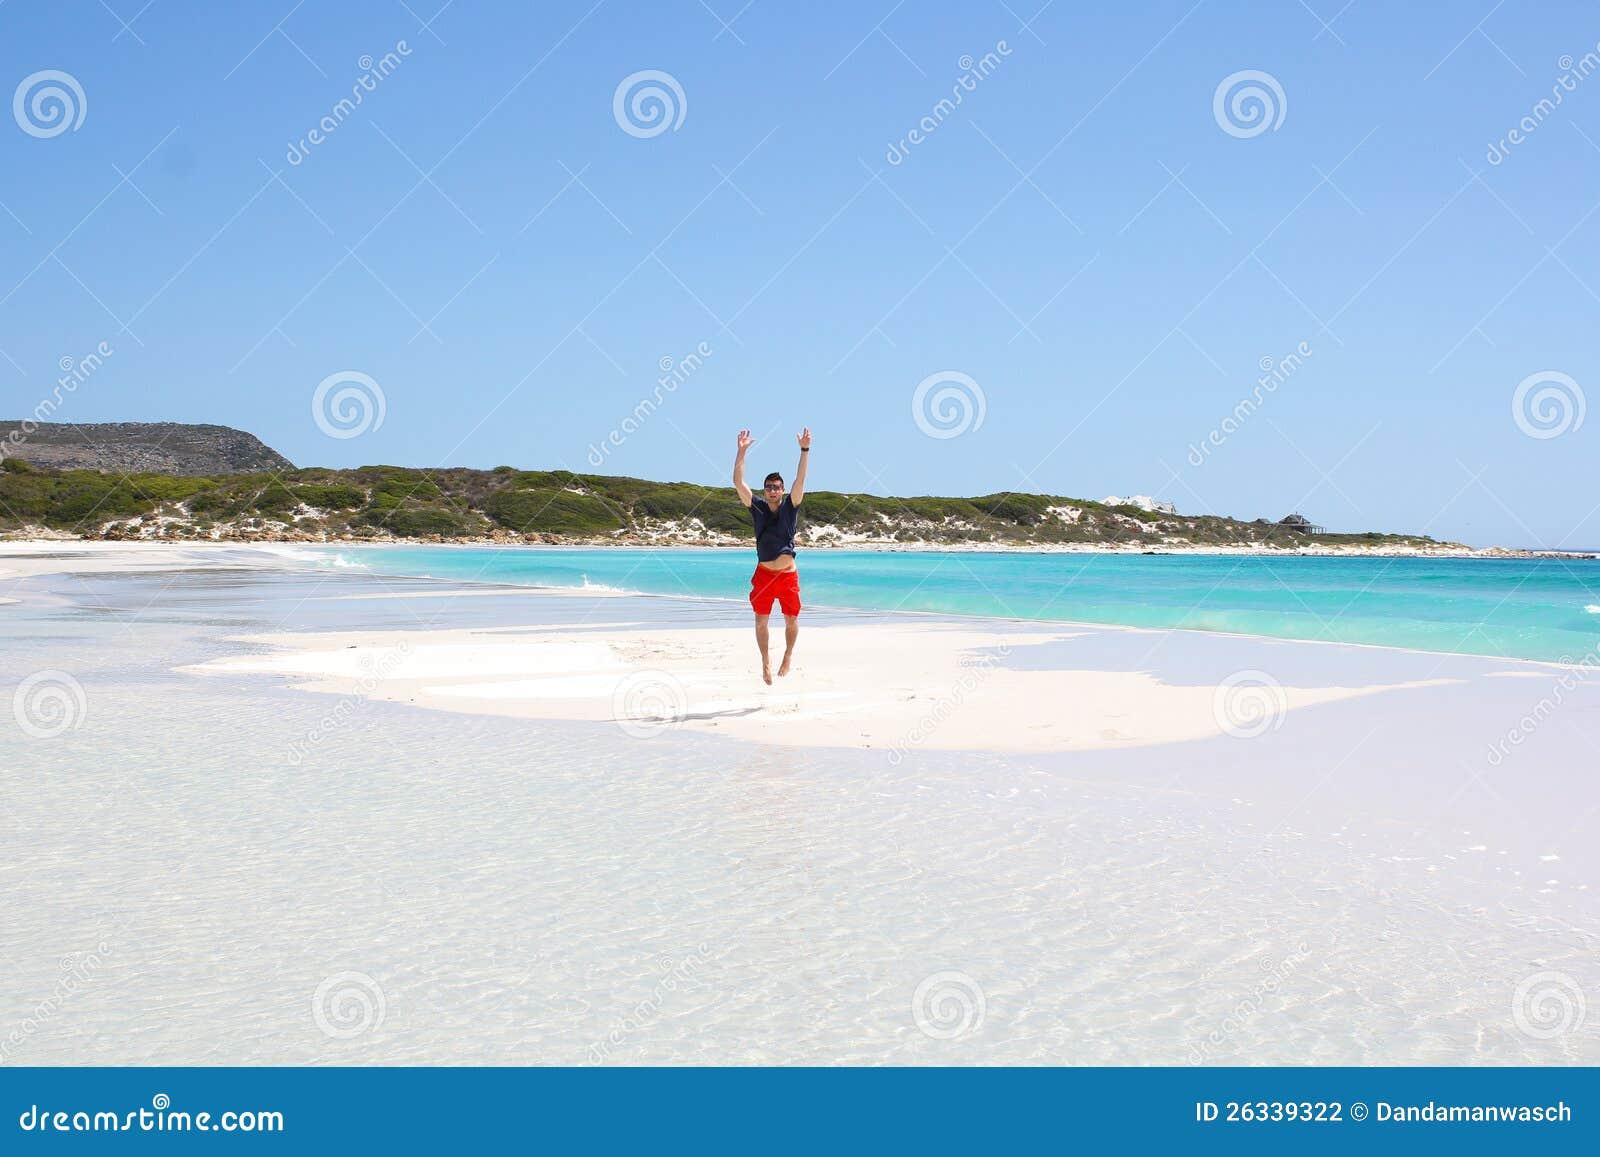 Man jumpin on small island